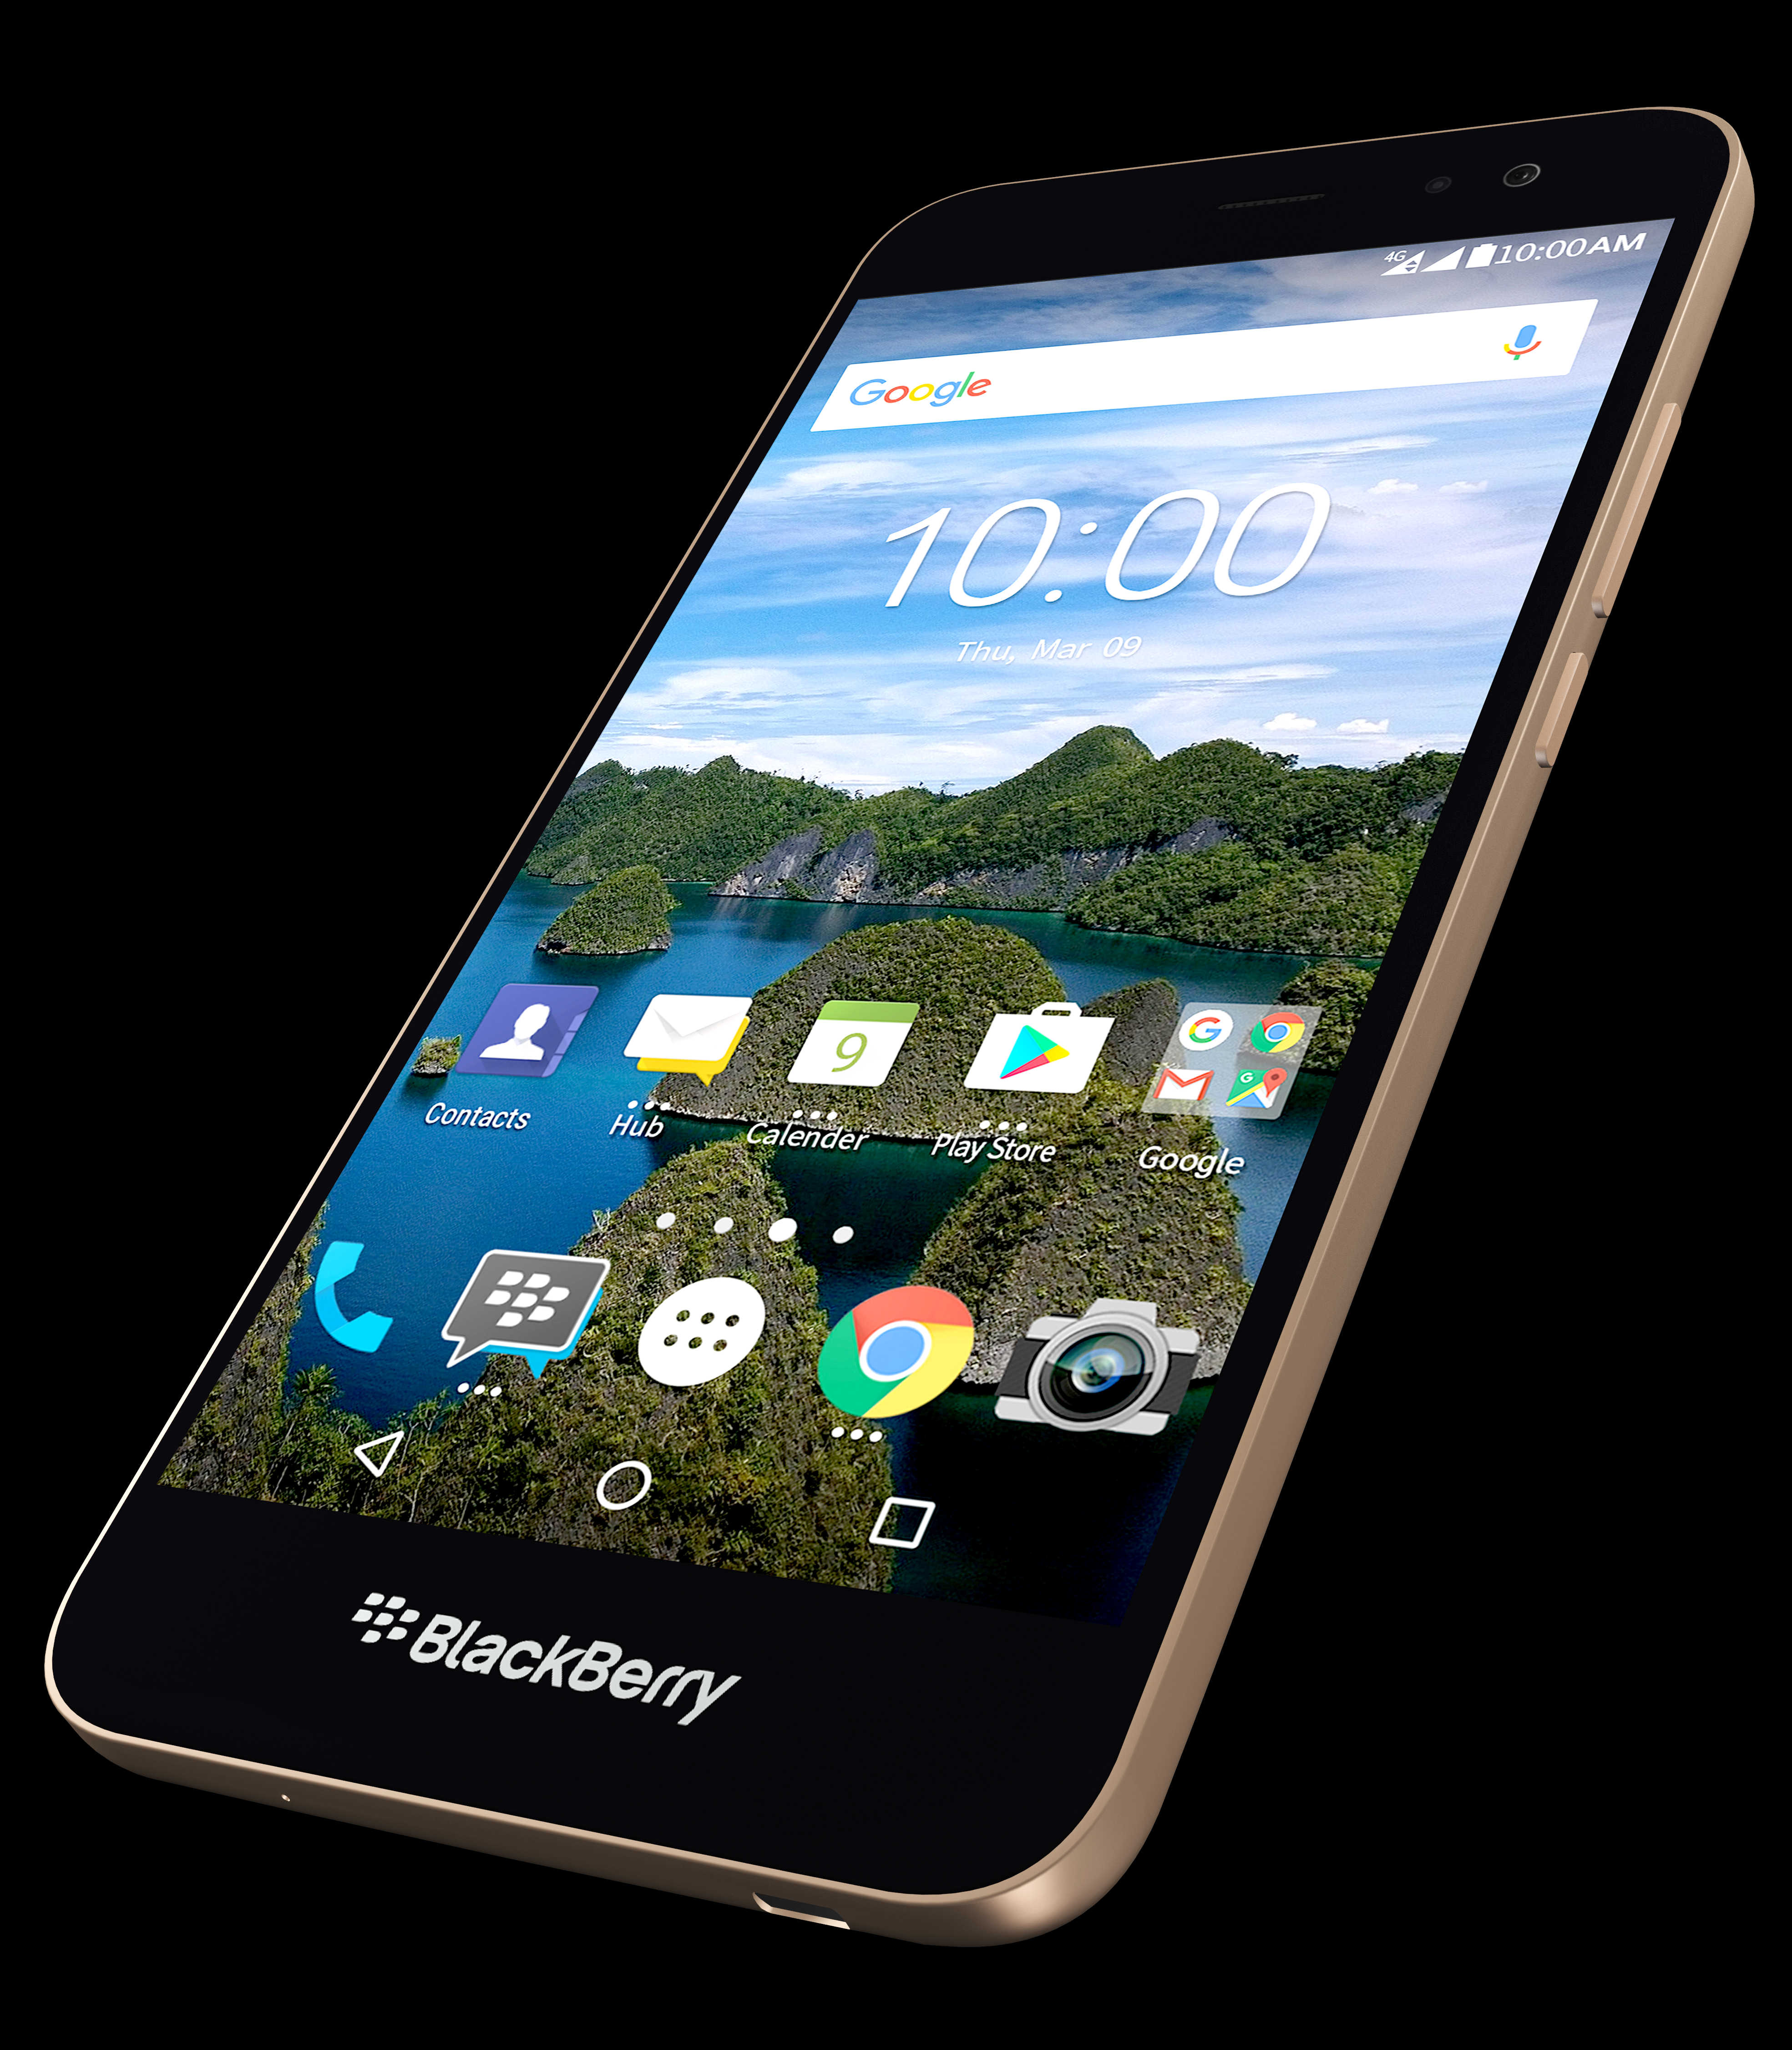 BlackBerry announces the Aurora smartphone in Indonesia